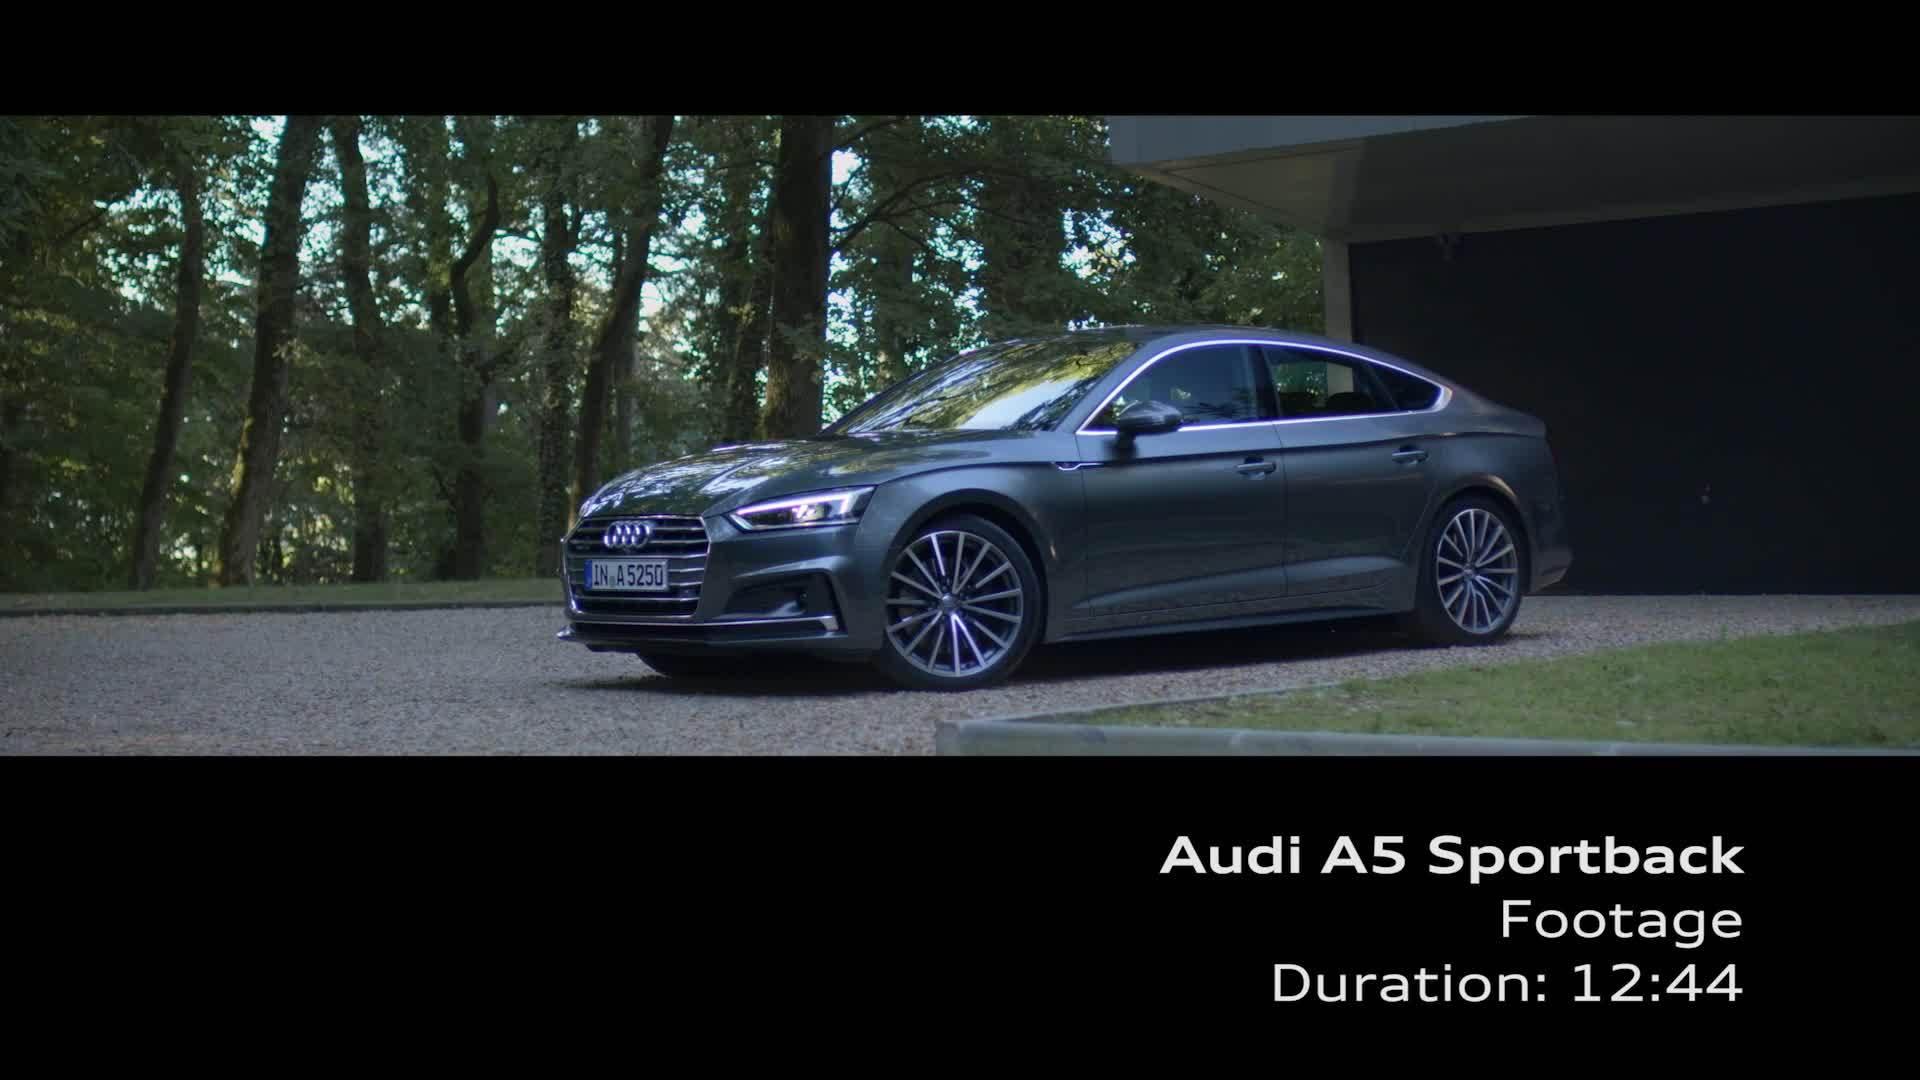 medium resolution of audi a5 sportback footage